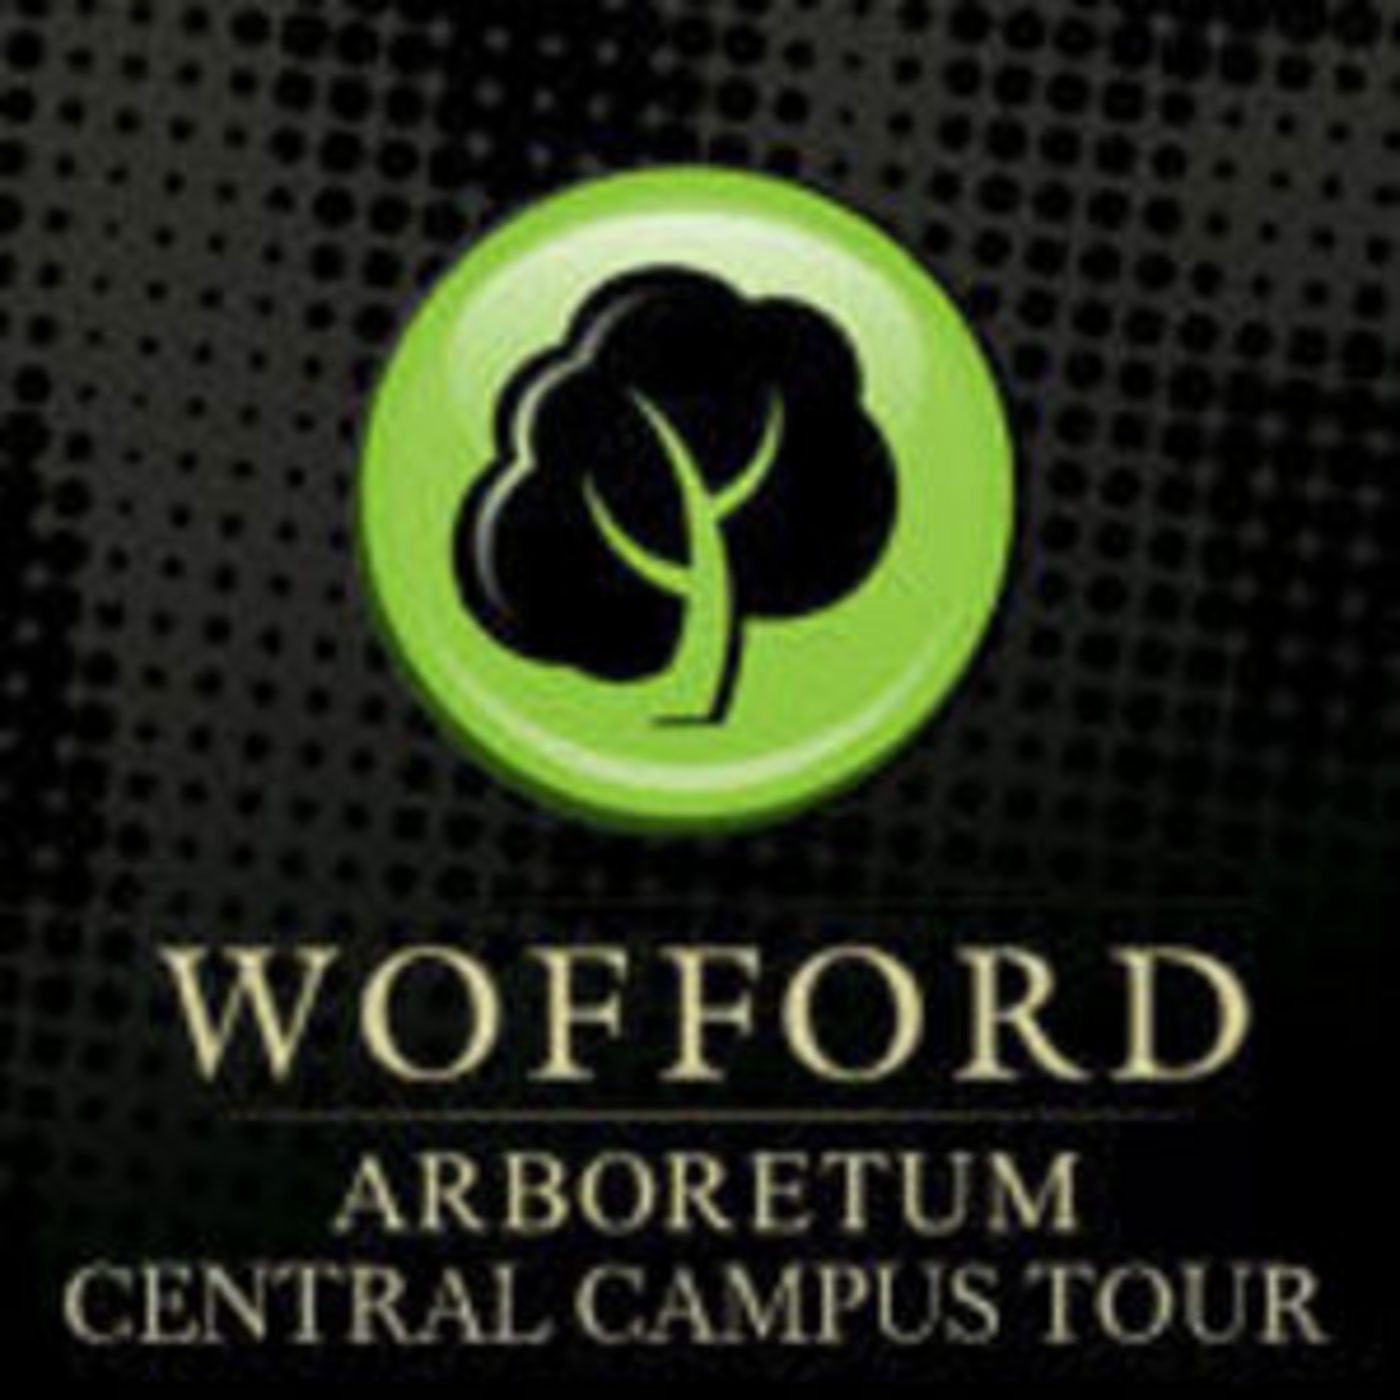 <![CDATA[Wofford Arboretum Central Campus]]>